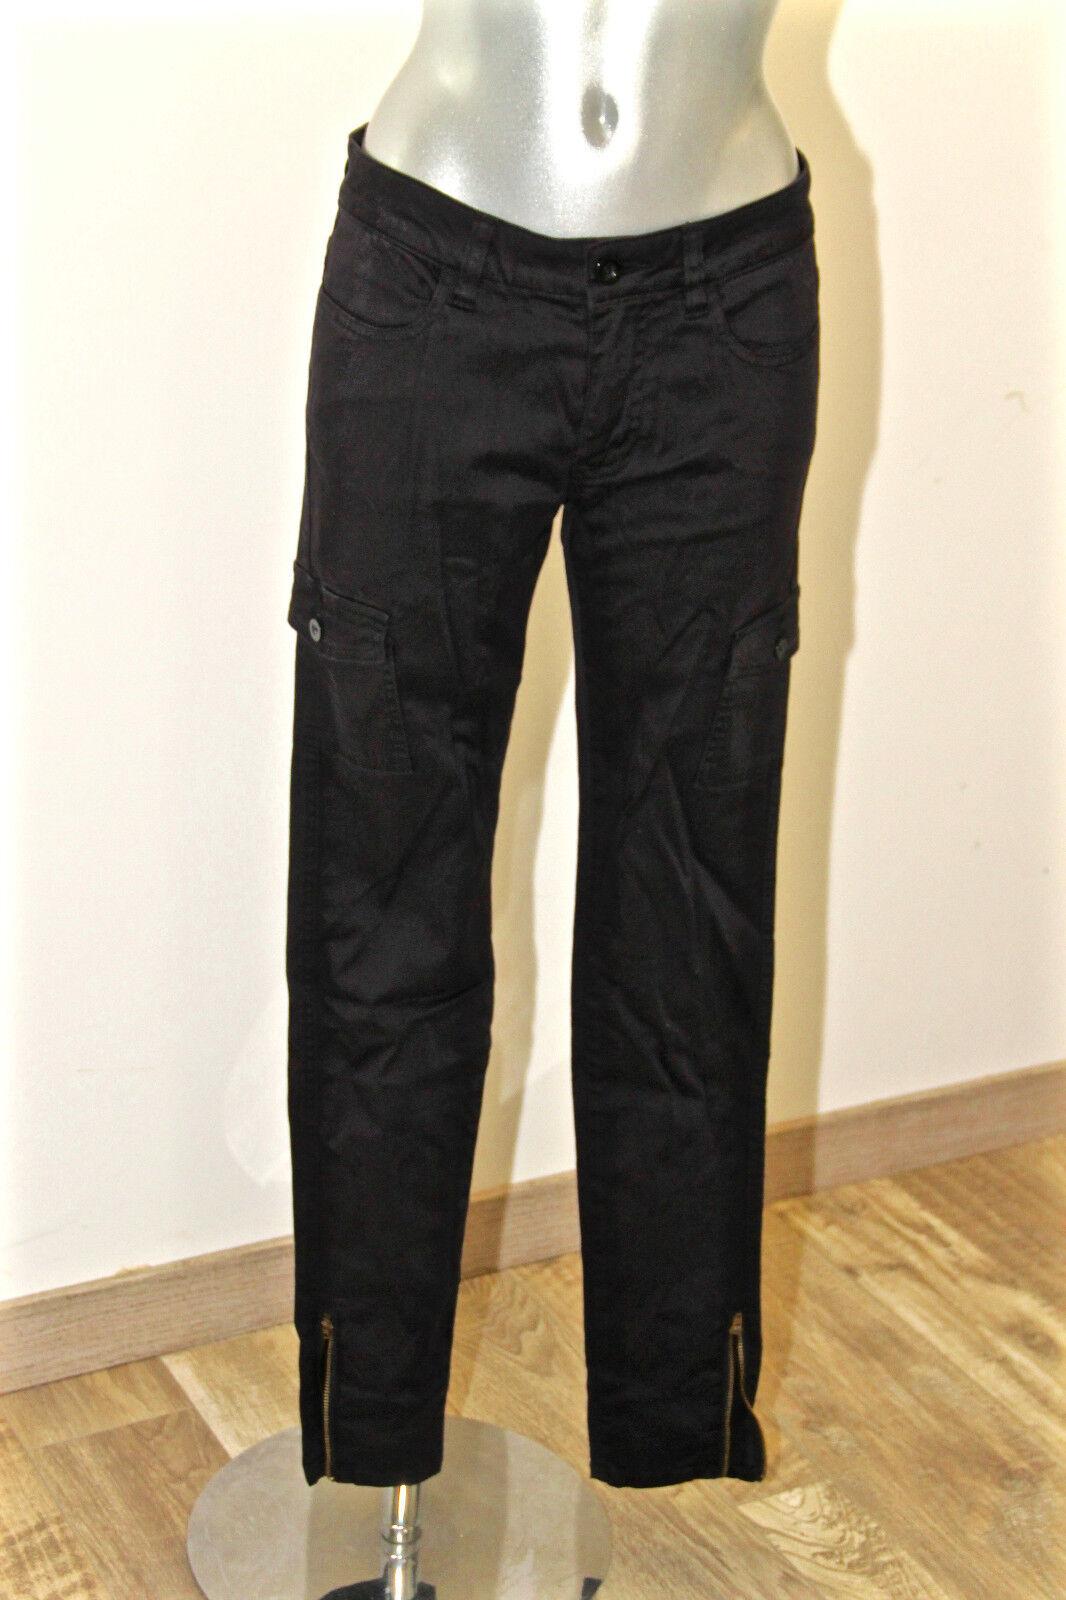 Pantalon slim fit marine zippé ED HARDY  hallyday T 38 fr 42i  NEUF valeur